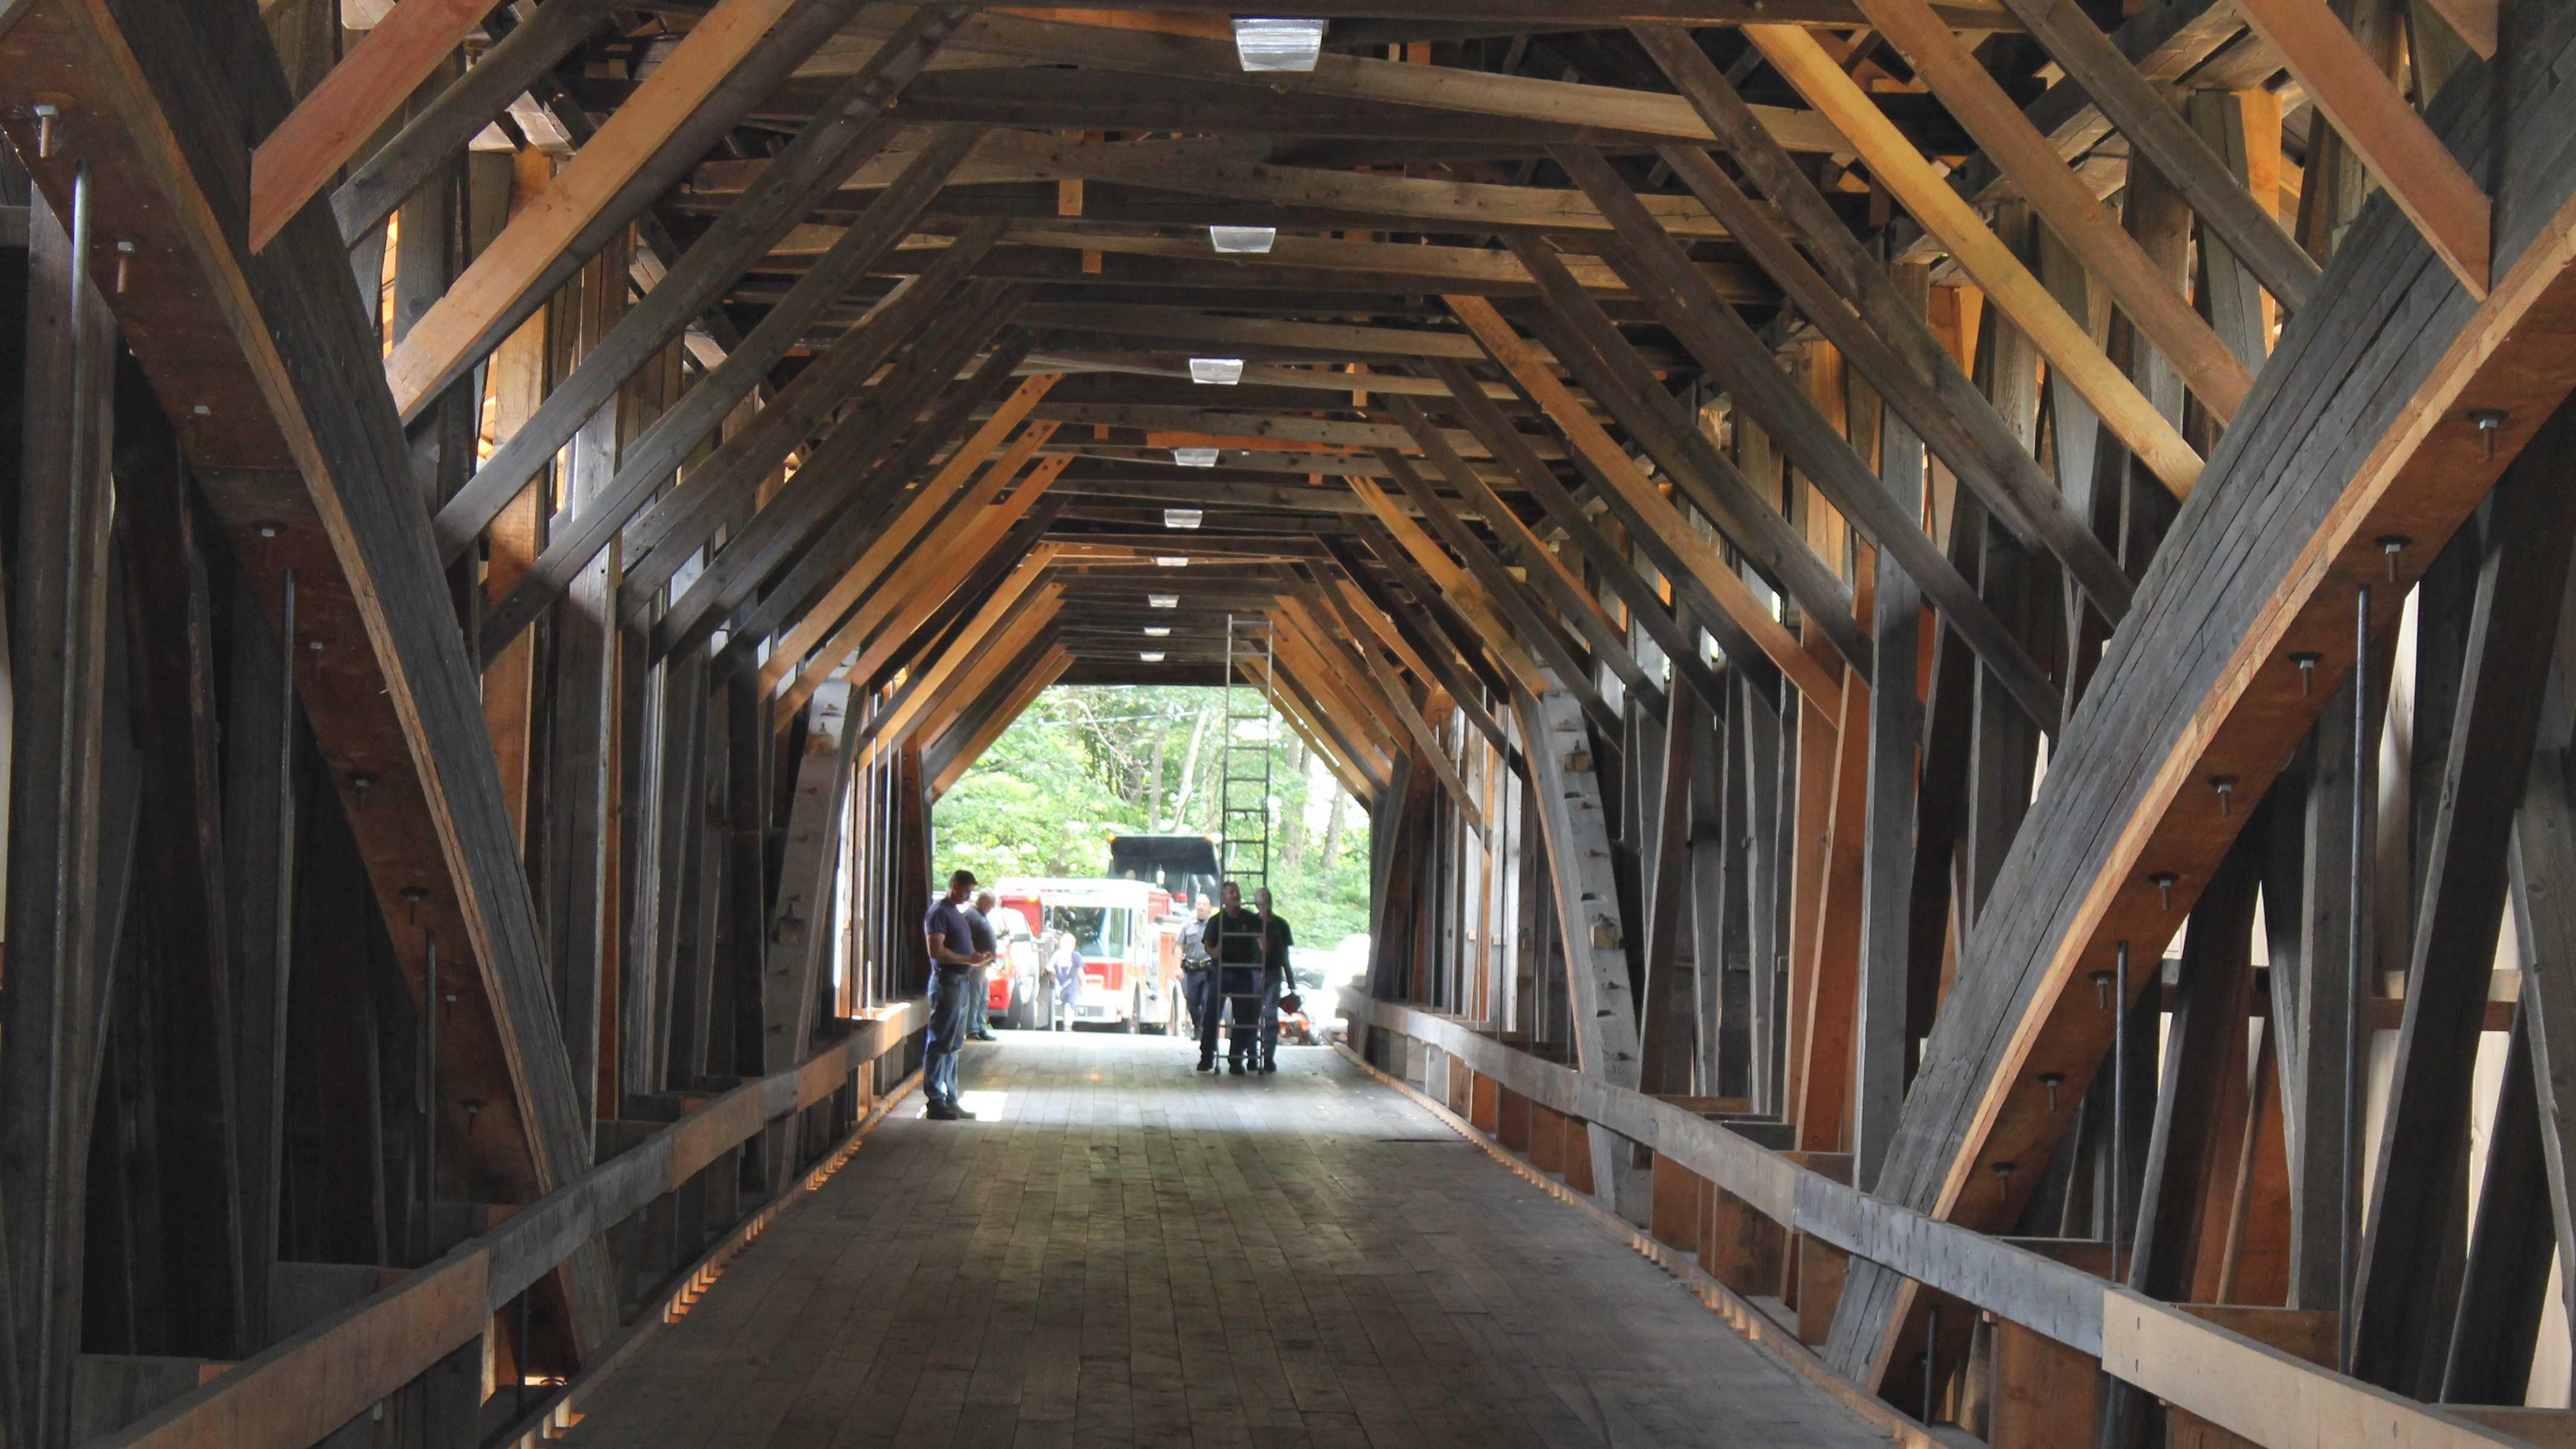 Campton Bridge damaged by box truck